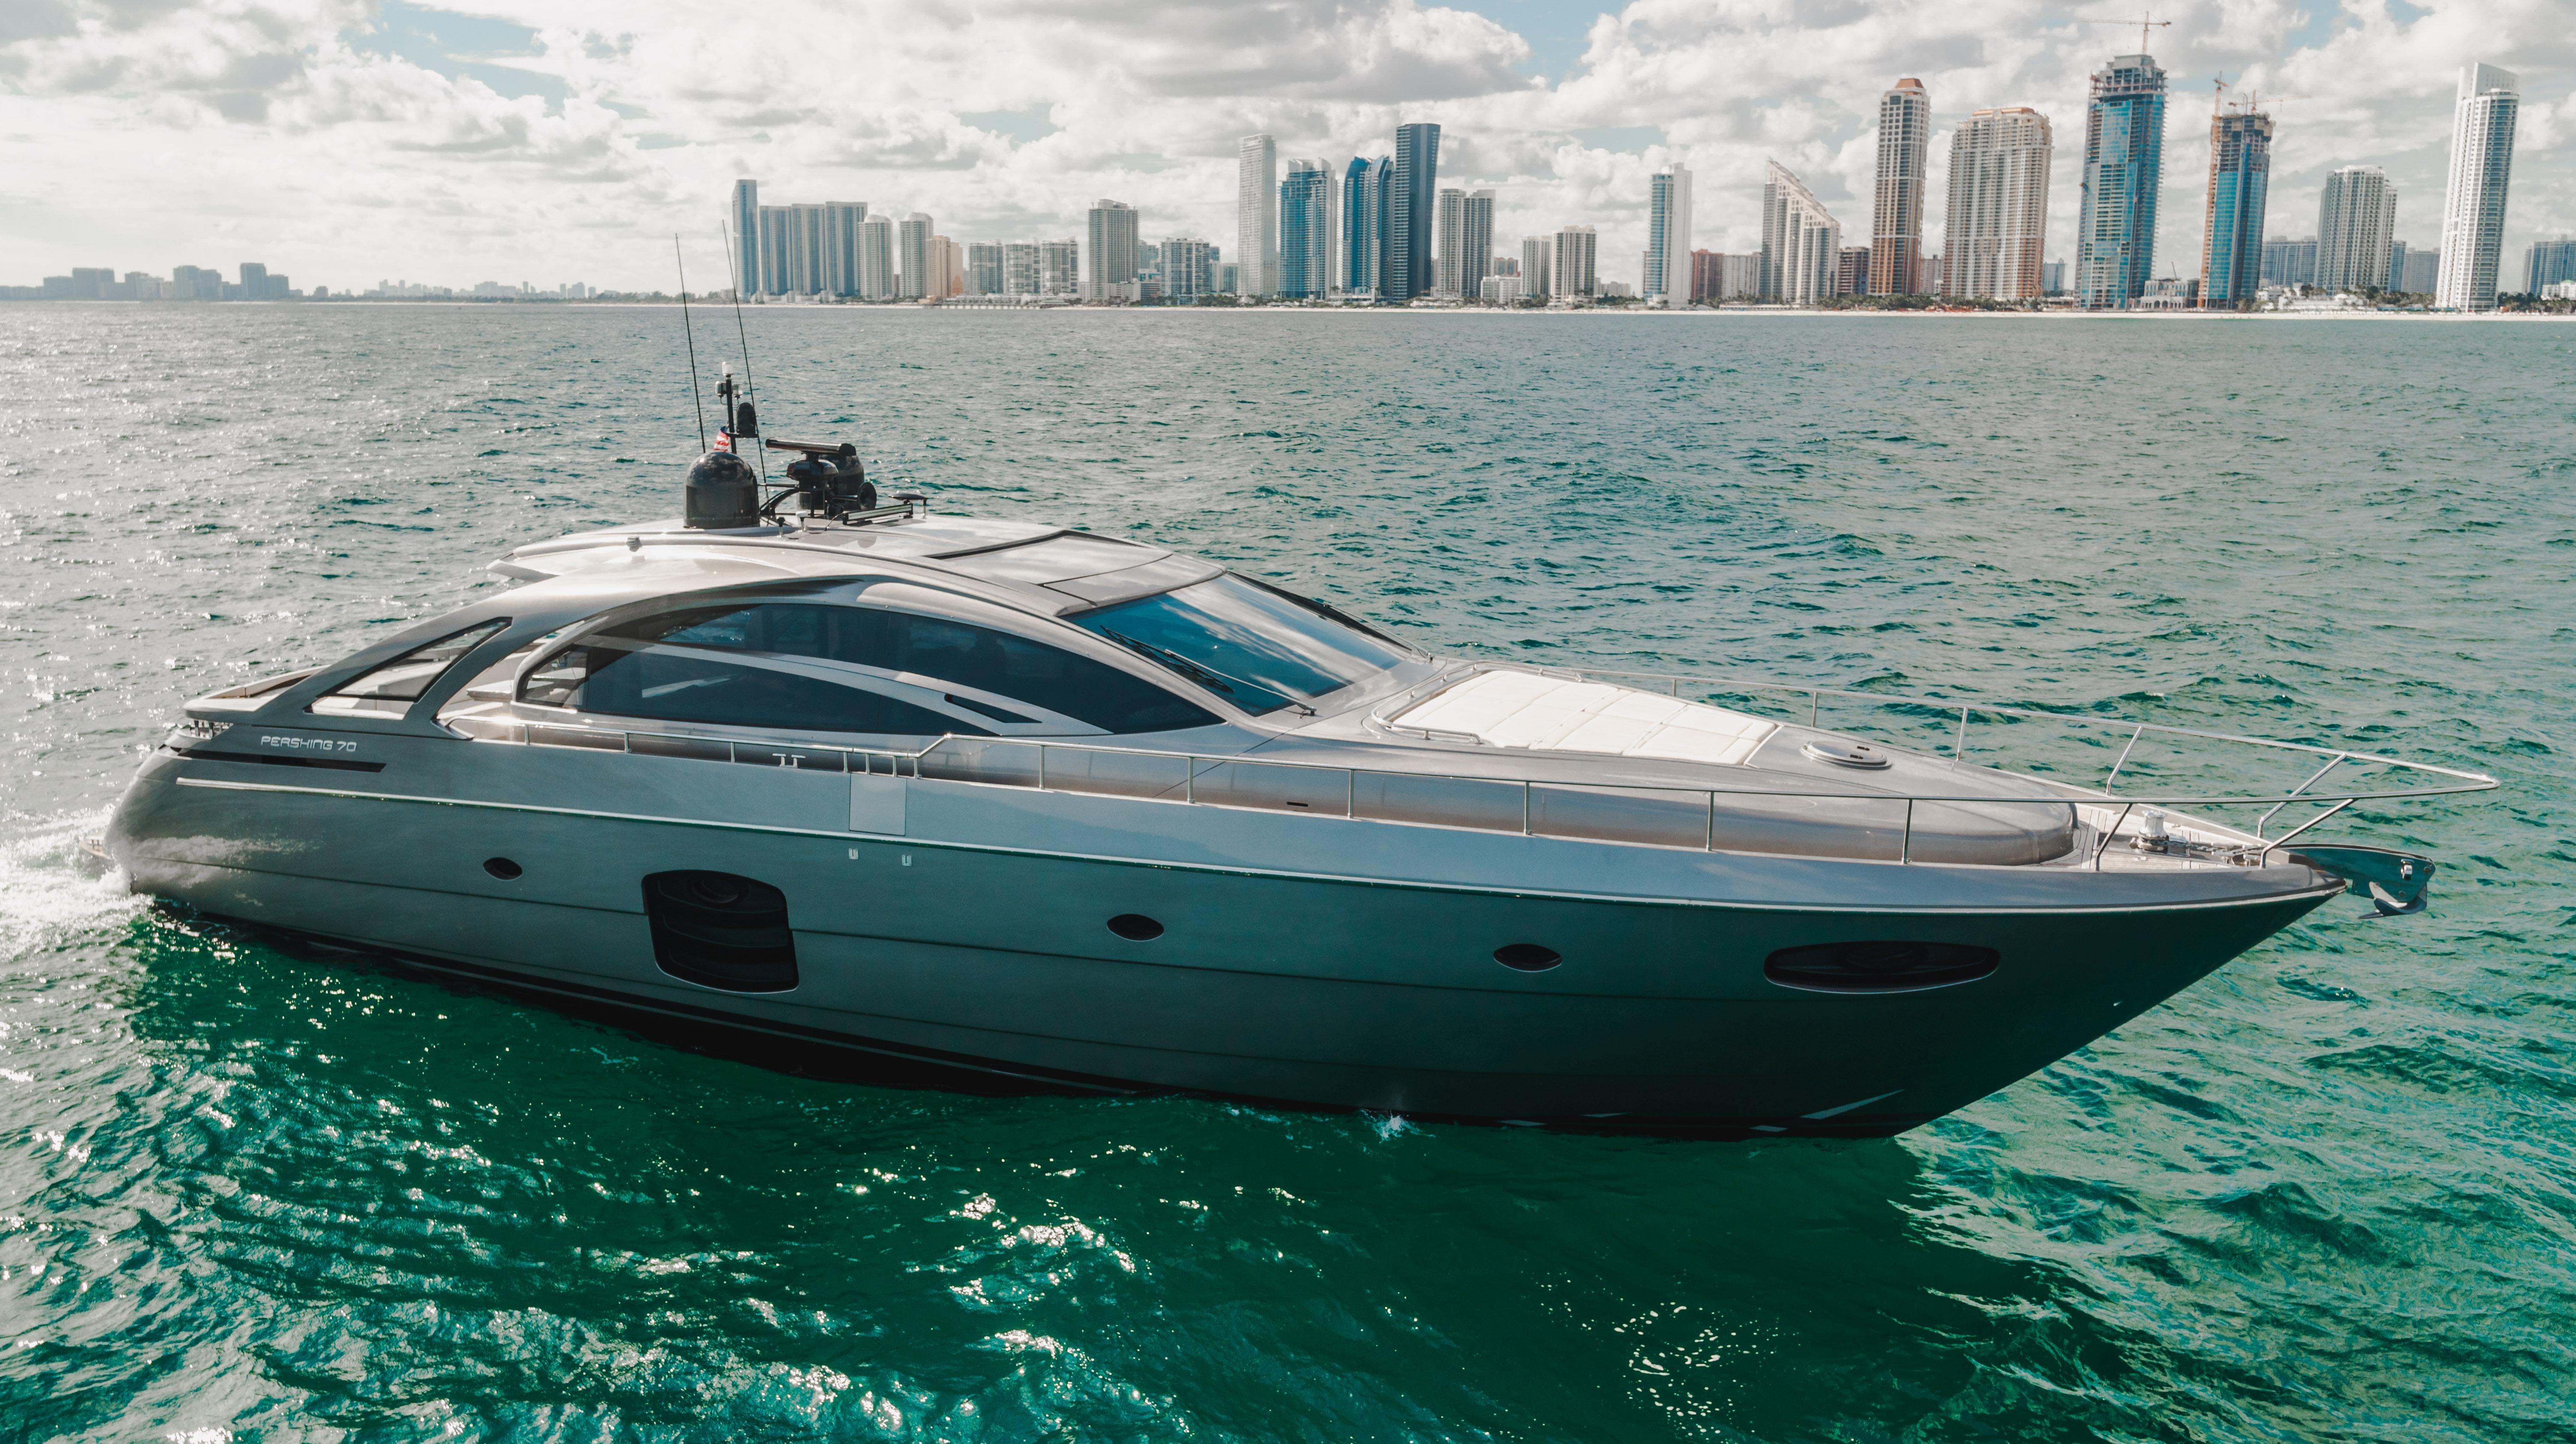 2015 Pershing 70 Motor Yacht - Andiamo - Starboard Profile